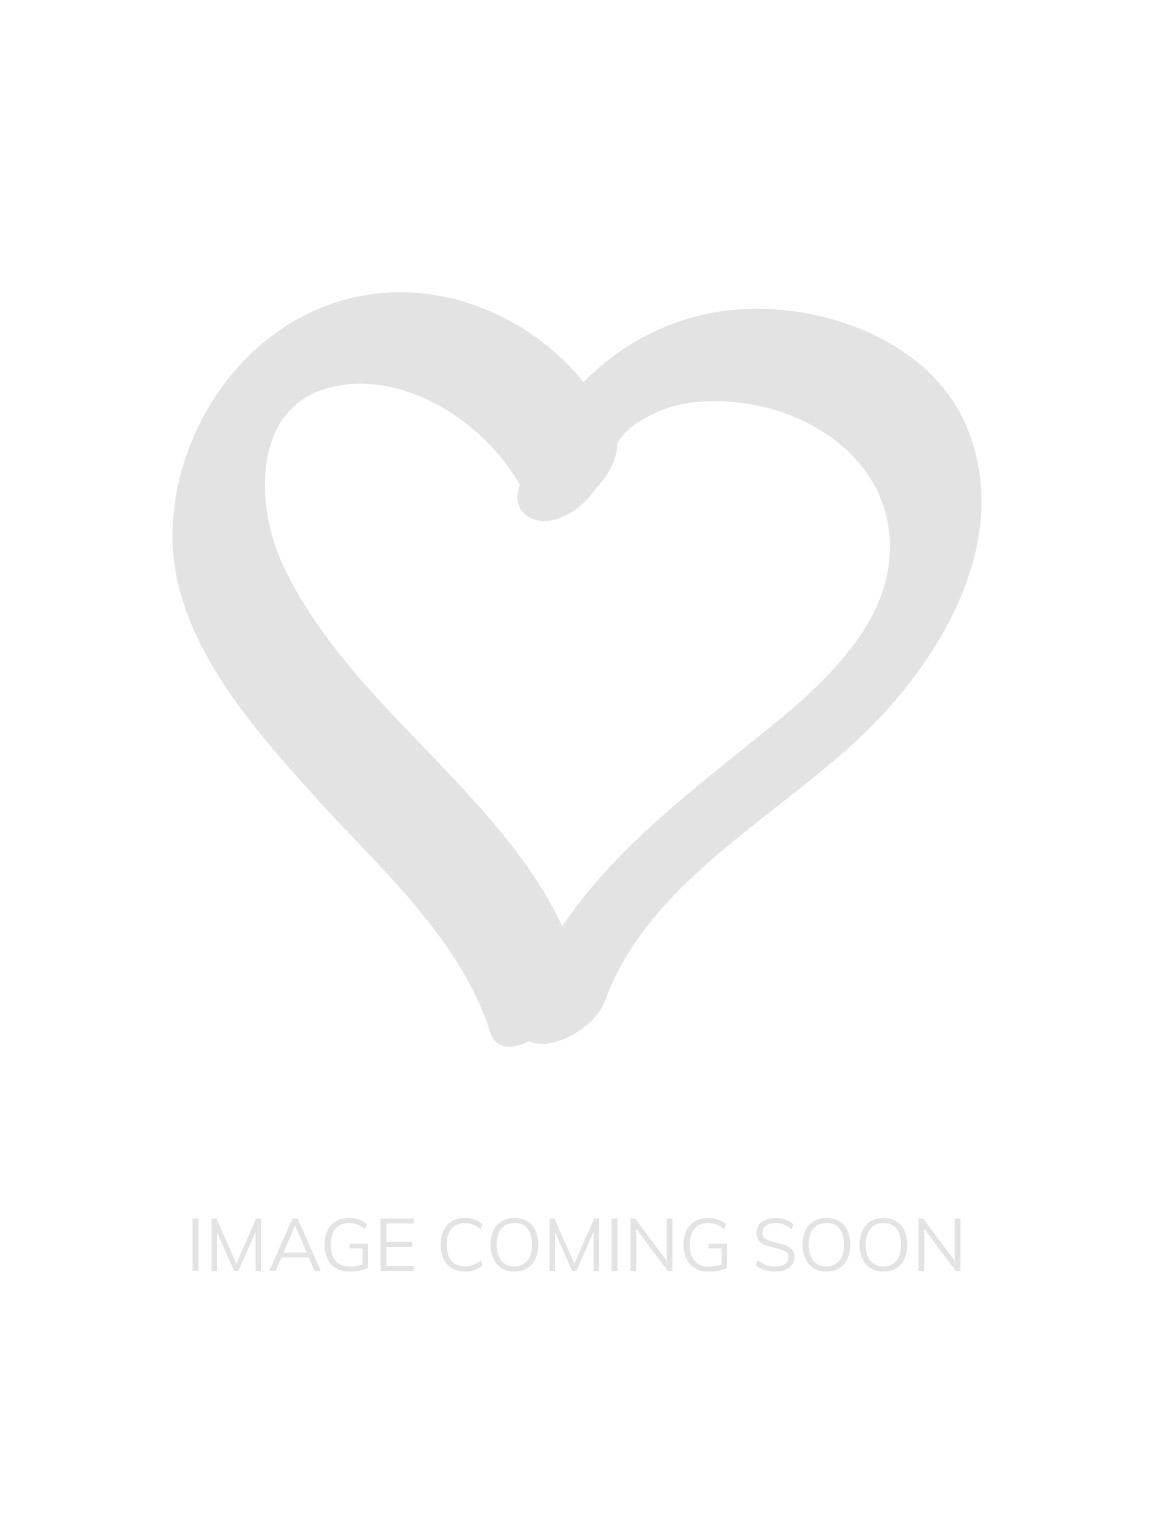 723b4f177bf2c Embrace Lace Plunge Bra - Naturally Nude Ivory